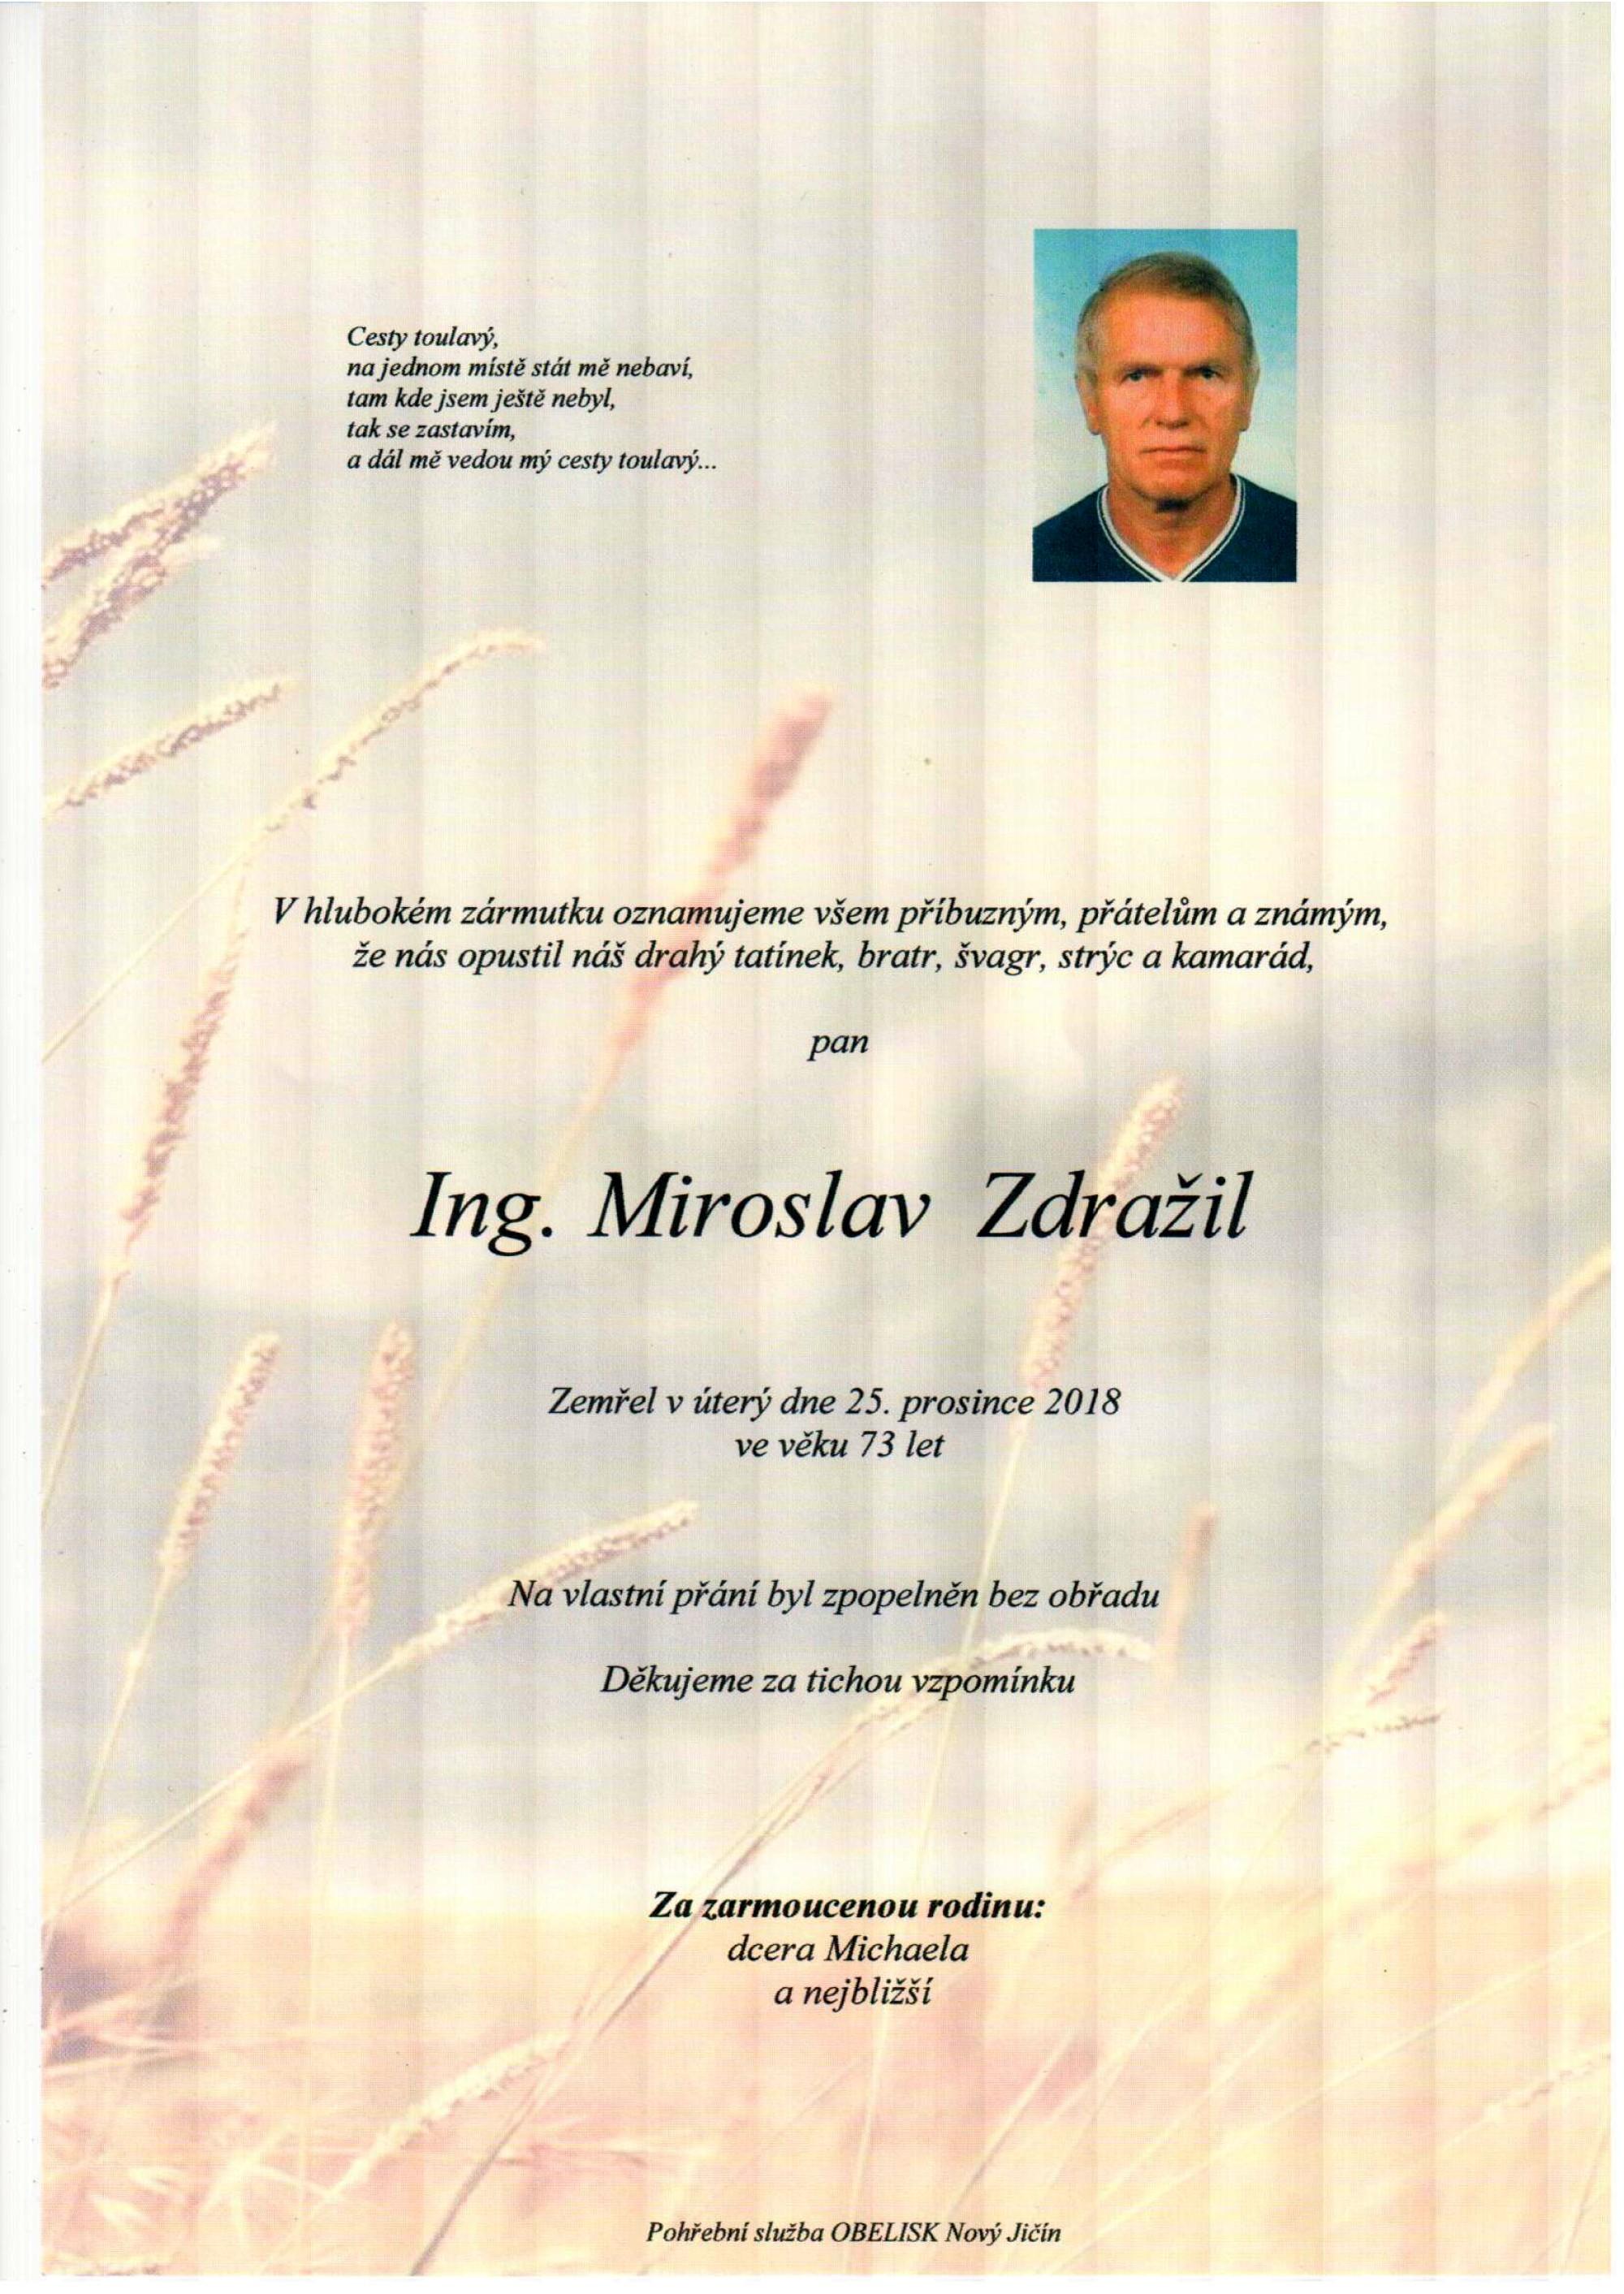 Ing. Miroslav Zdražil